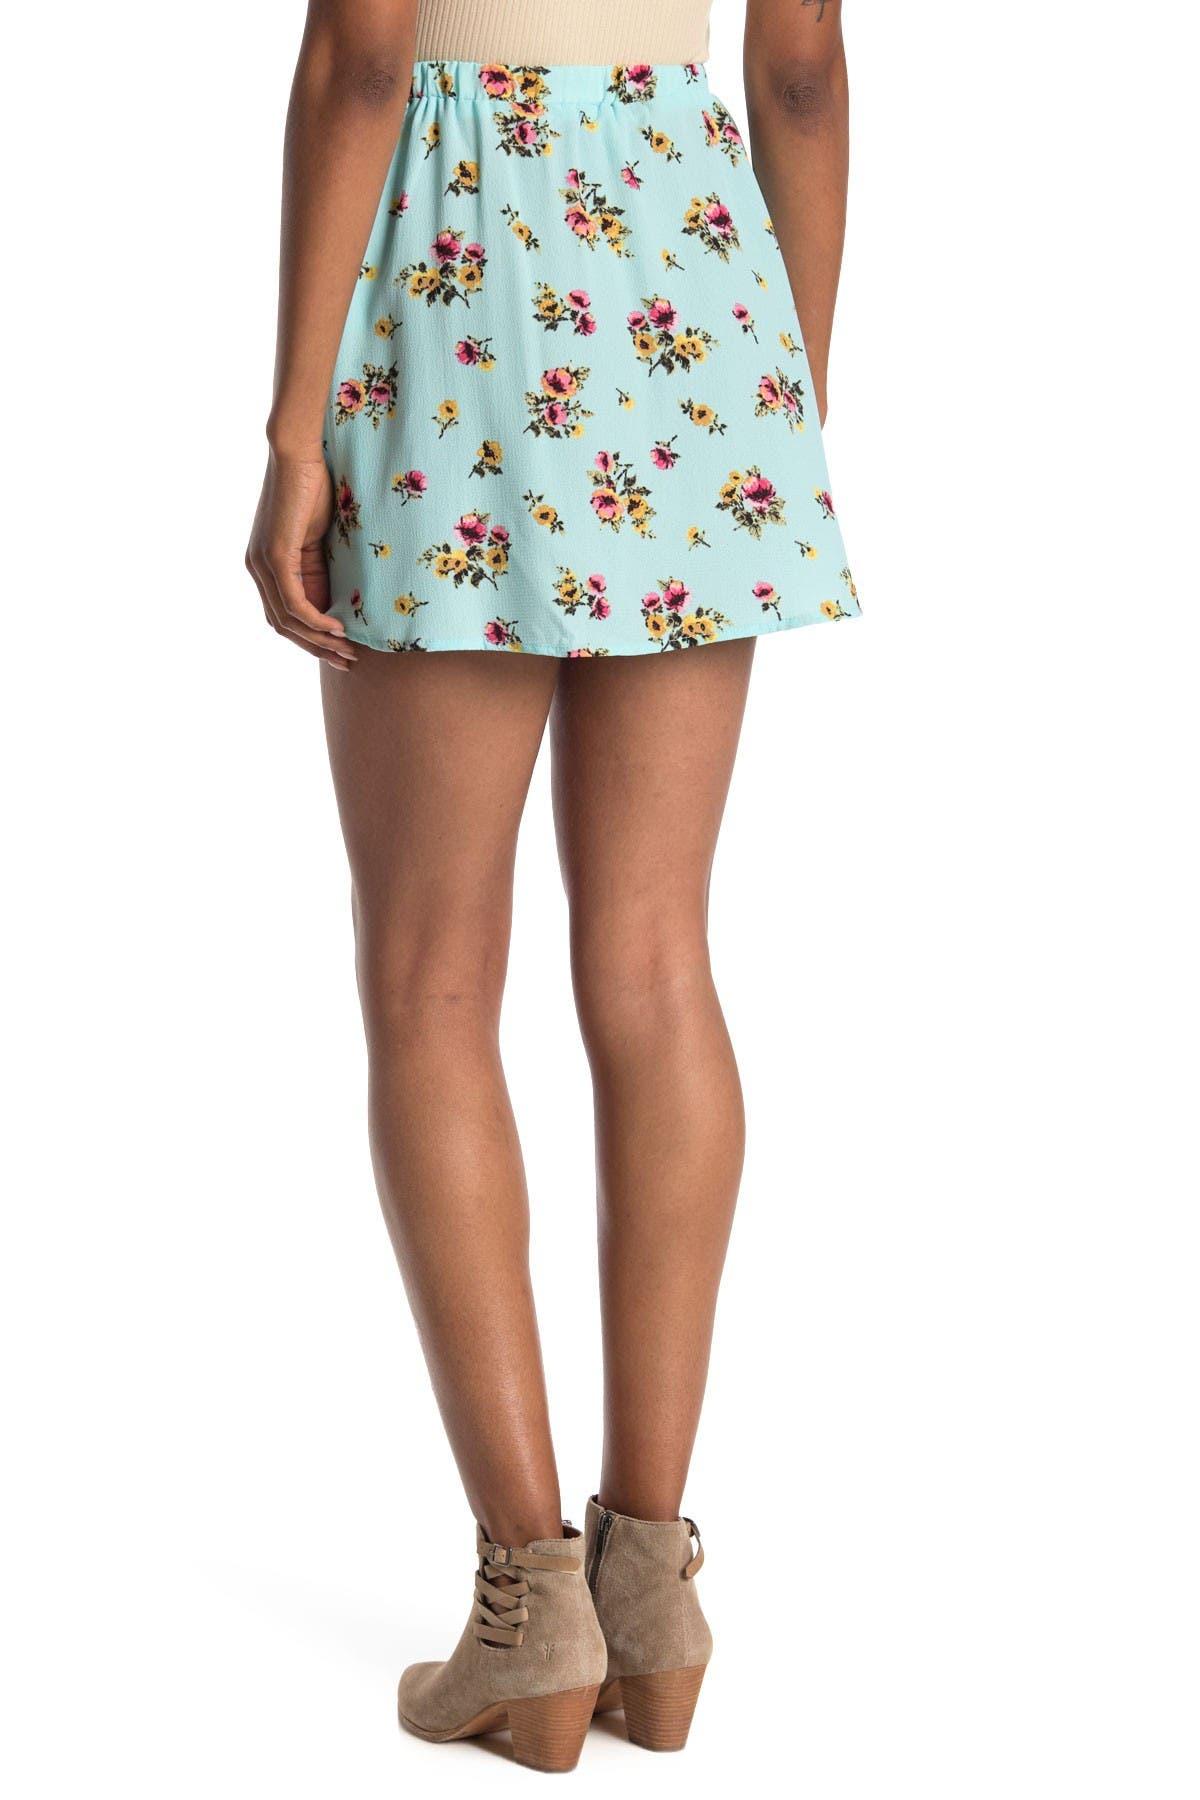 Image of GOOD LUCK GEM Button Accent Mini Skirt